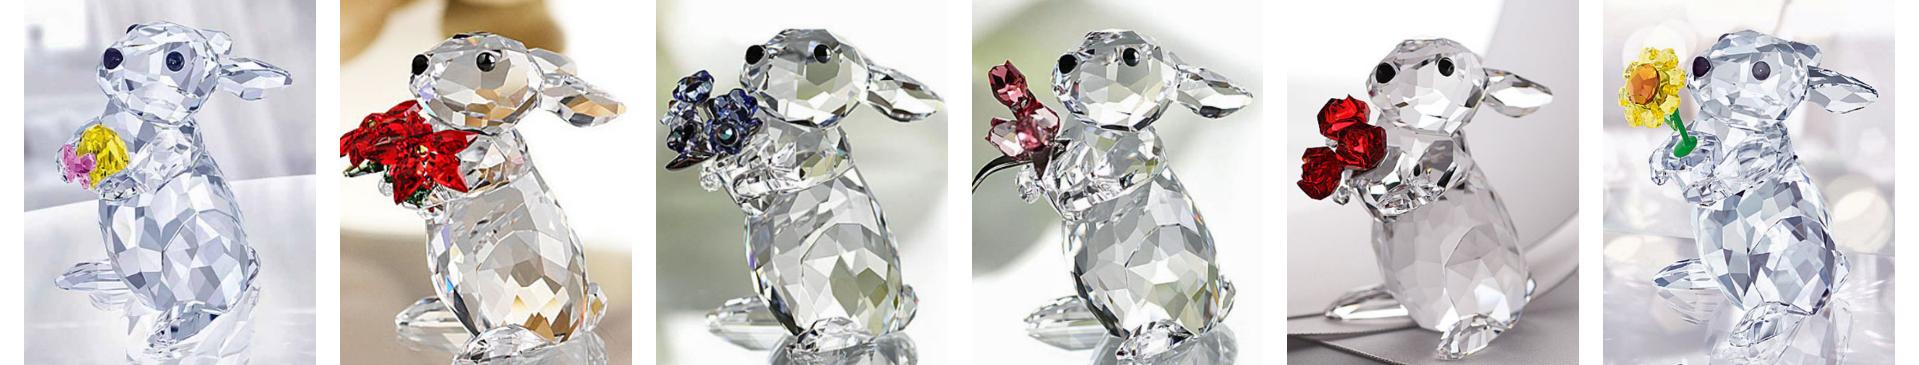 Rabbits 6